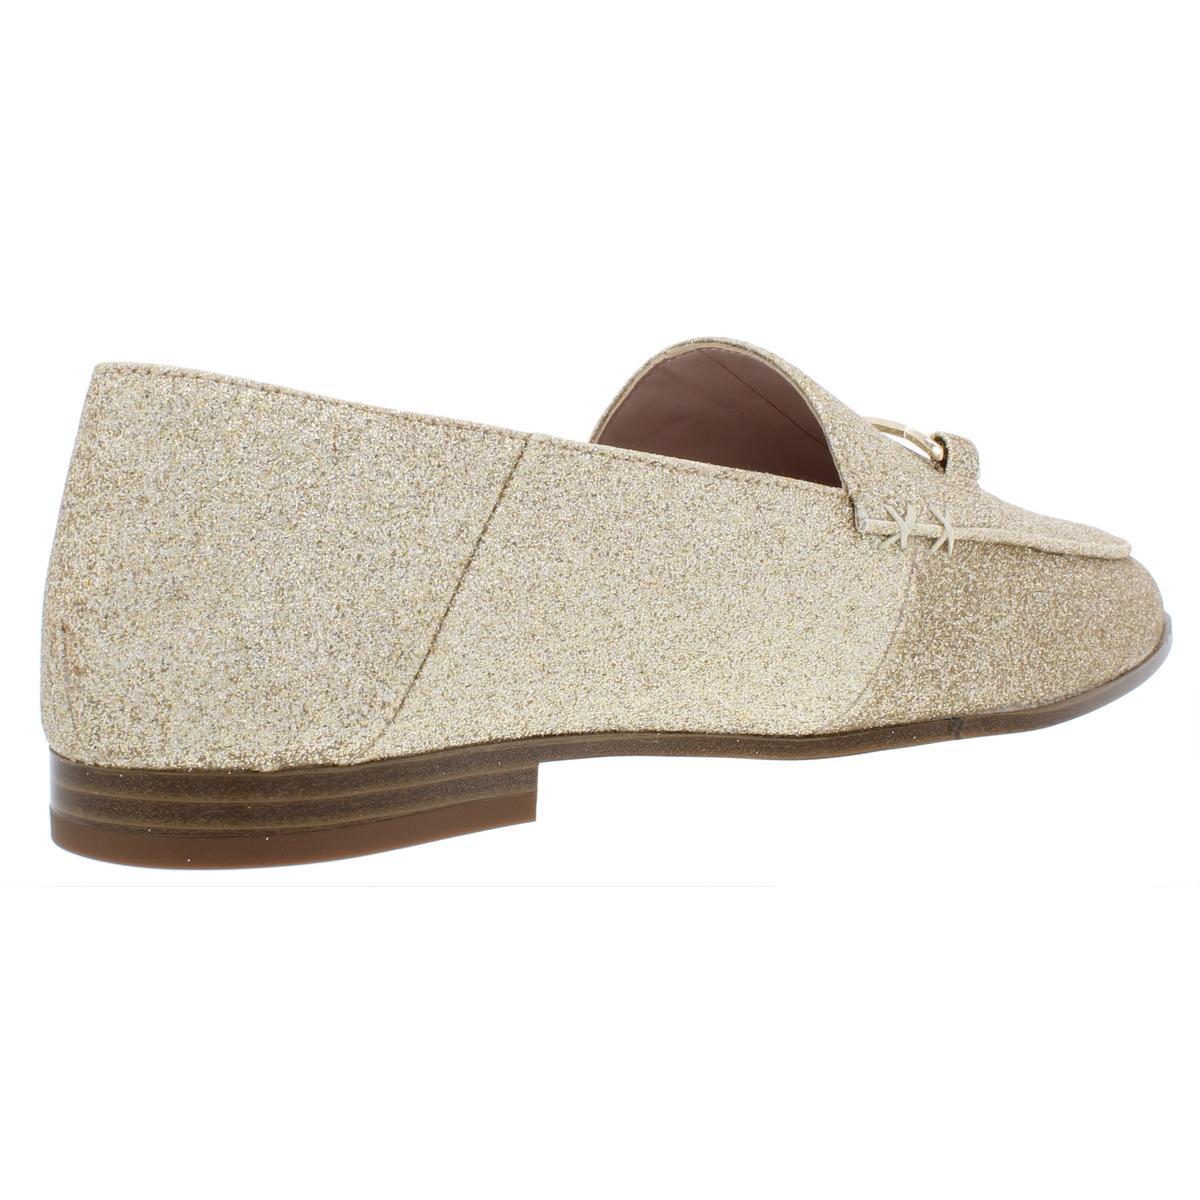 Nine-West-Womens-Wildgirls-Glitter-Slip-On-Embellished-Flats-Shoes-BHFO-8209 thumbnail 4